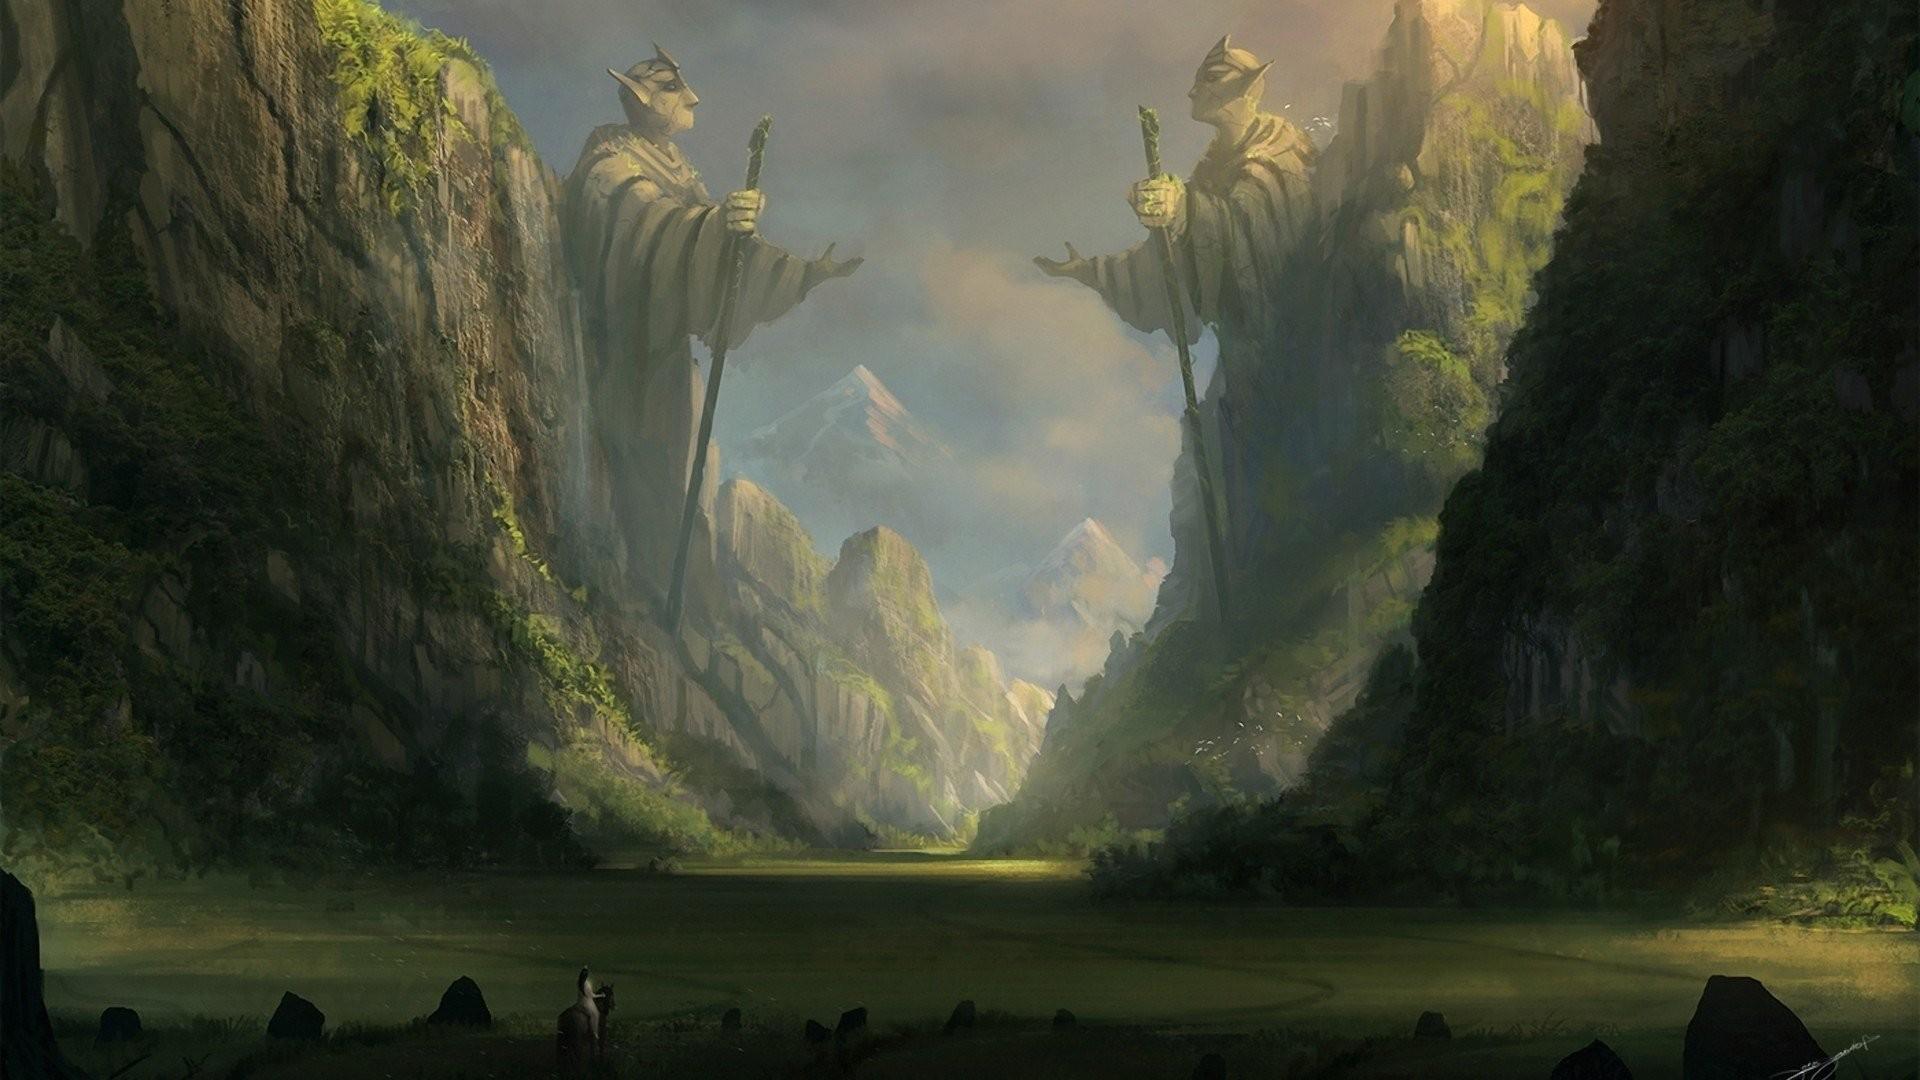 2100x1200 Birth Of The Mormegil Silmarillion Lord Rings John Ronald Reuel Tolkien Narn I